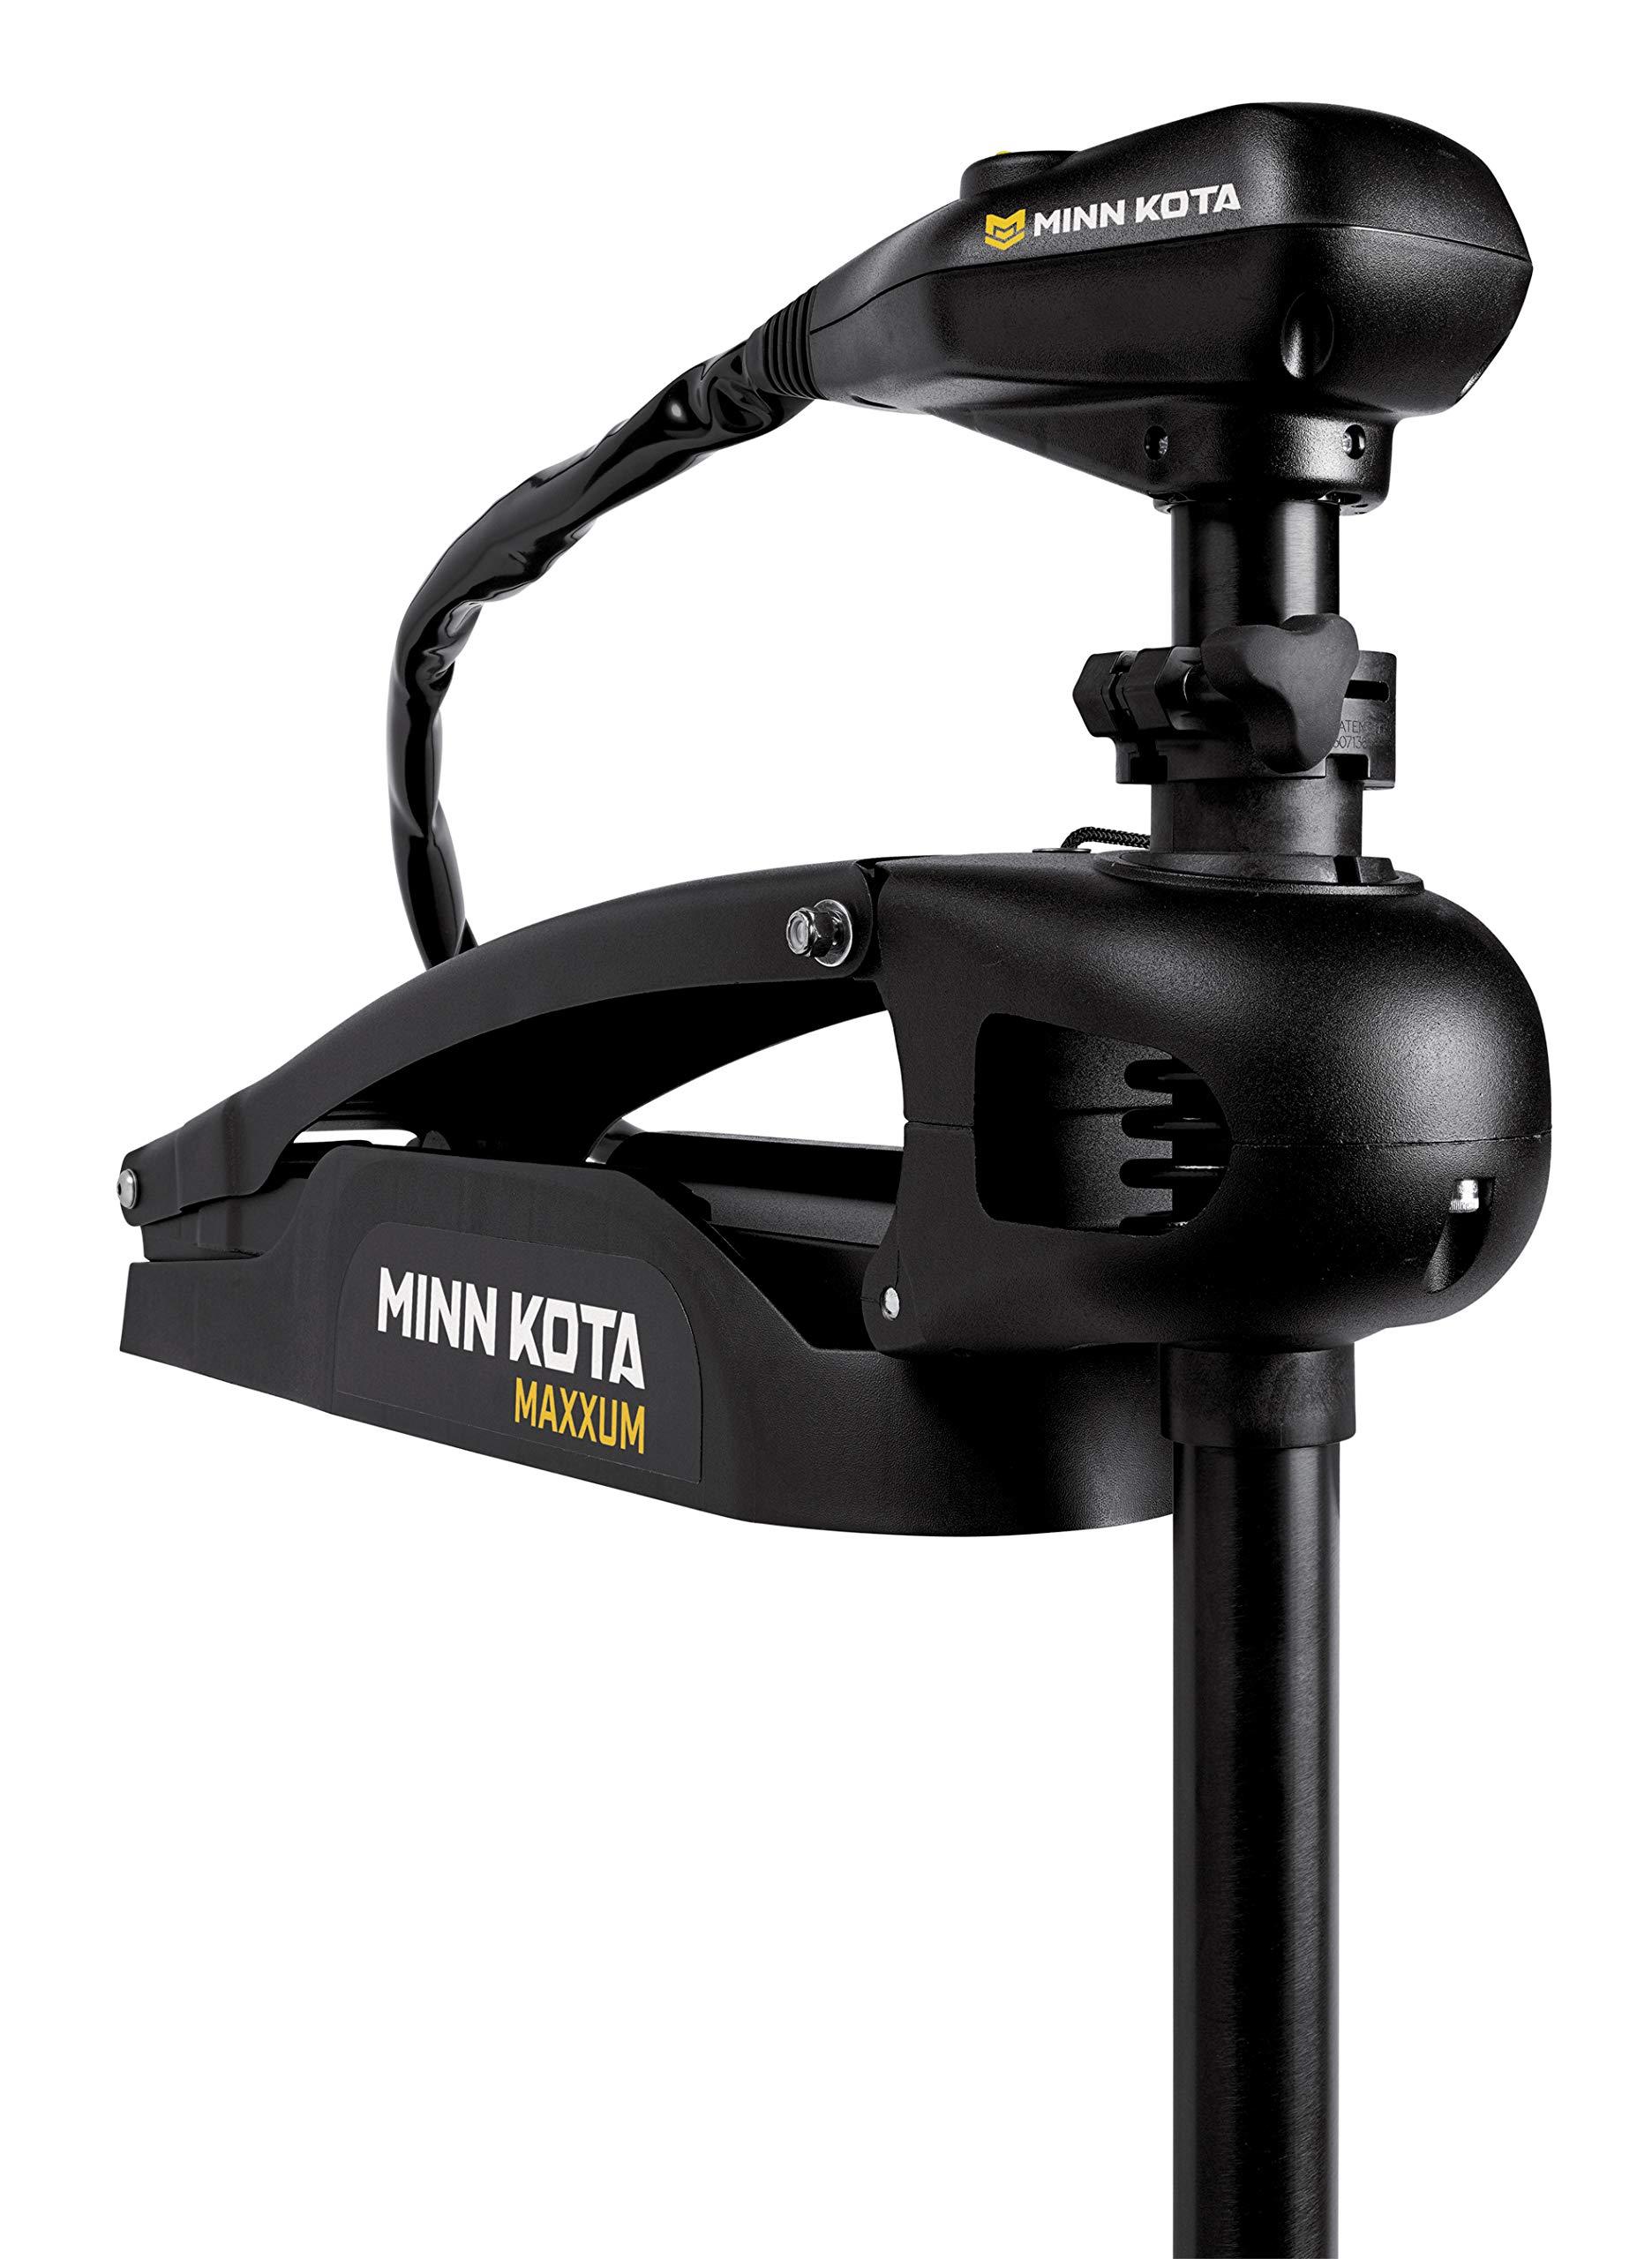 Minn Kota Maxxum Bowmount Trolling Motor with Hand/Foot Control